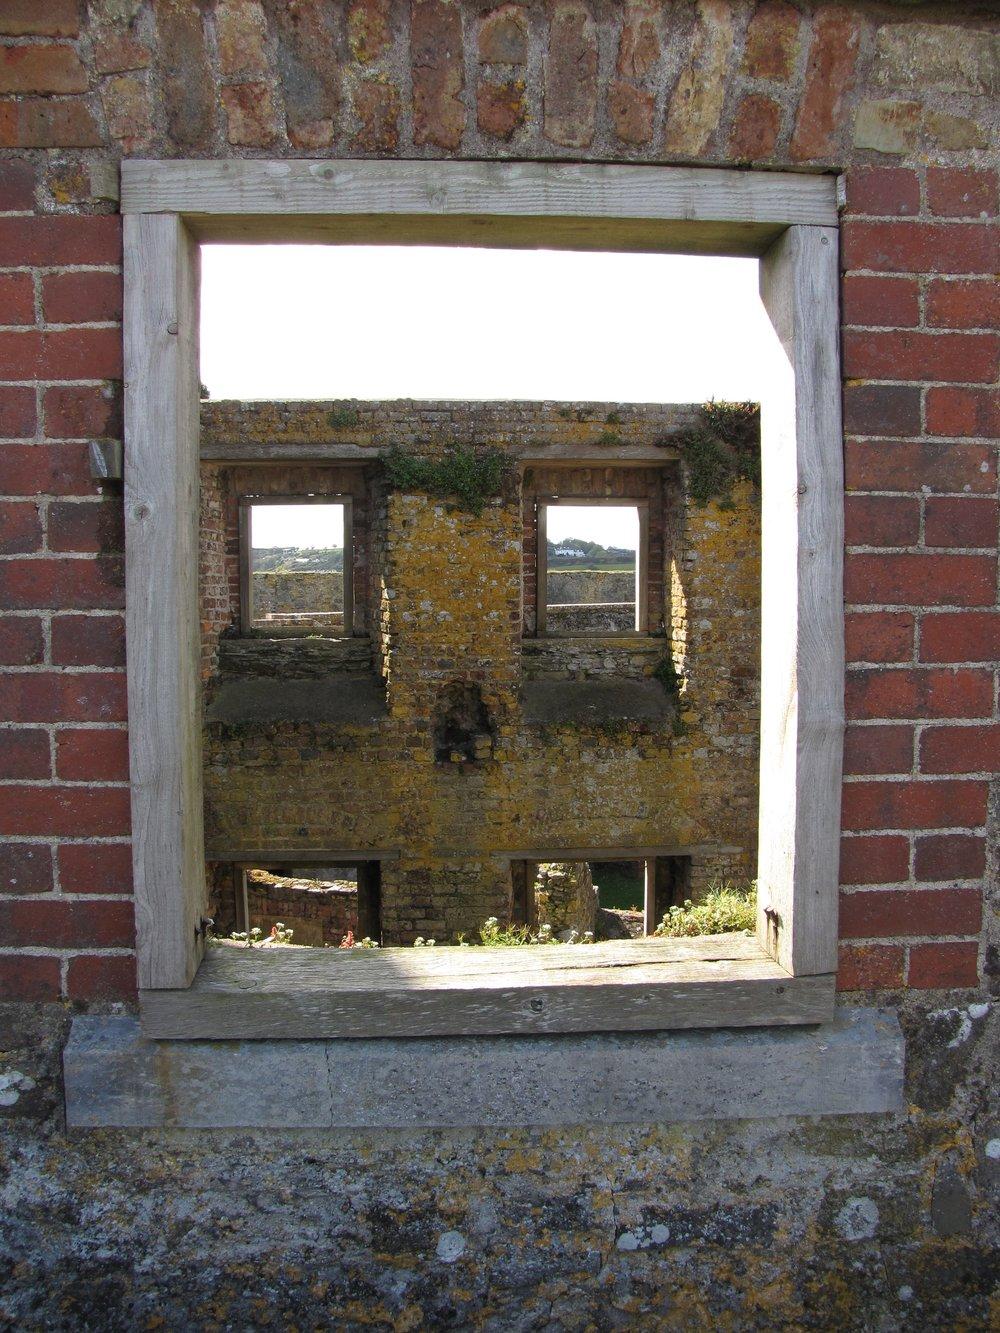 Ireland Building Through Brick Window.jpg